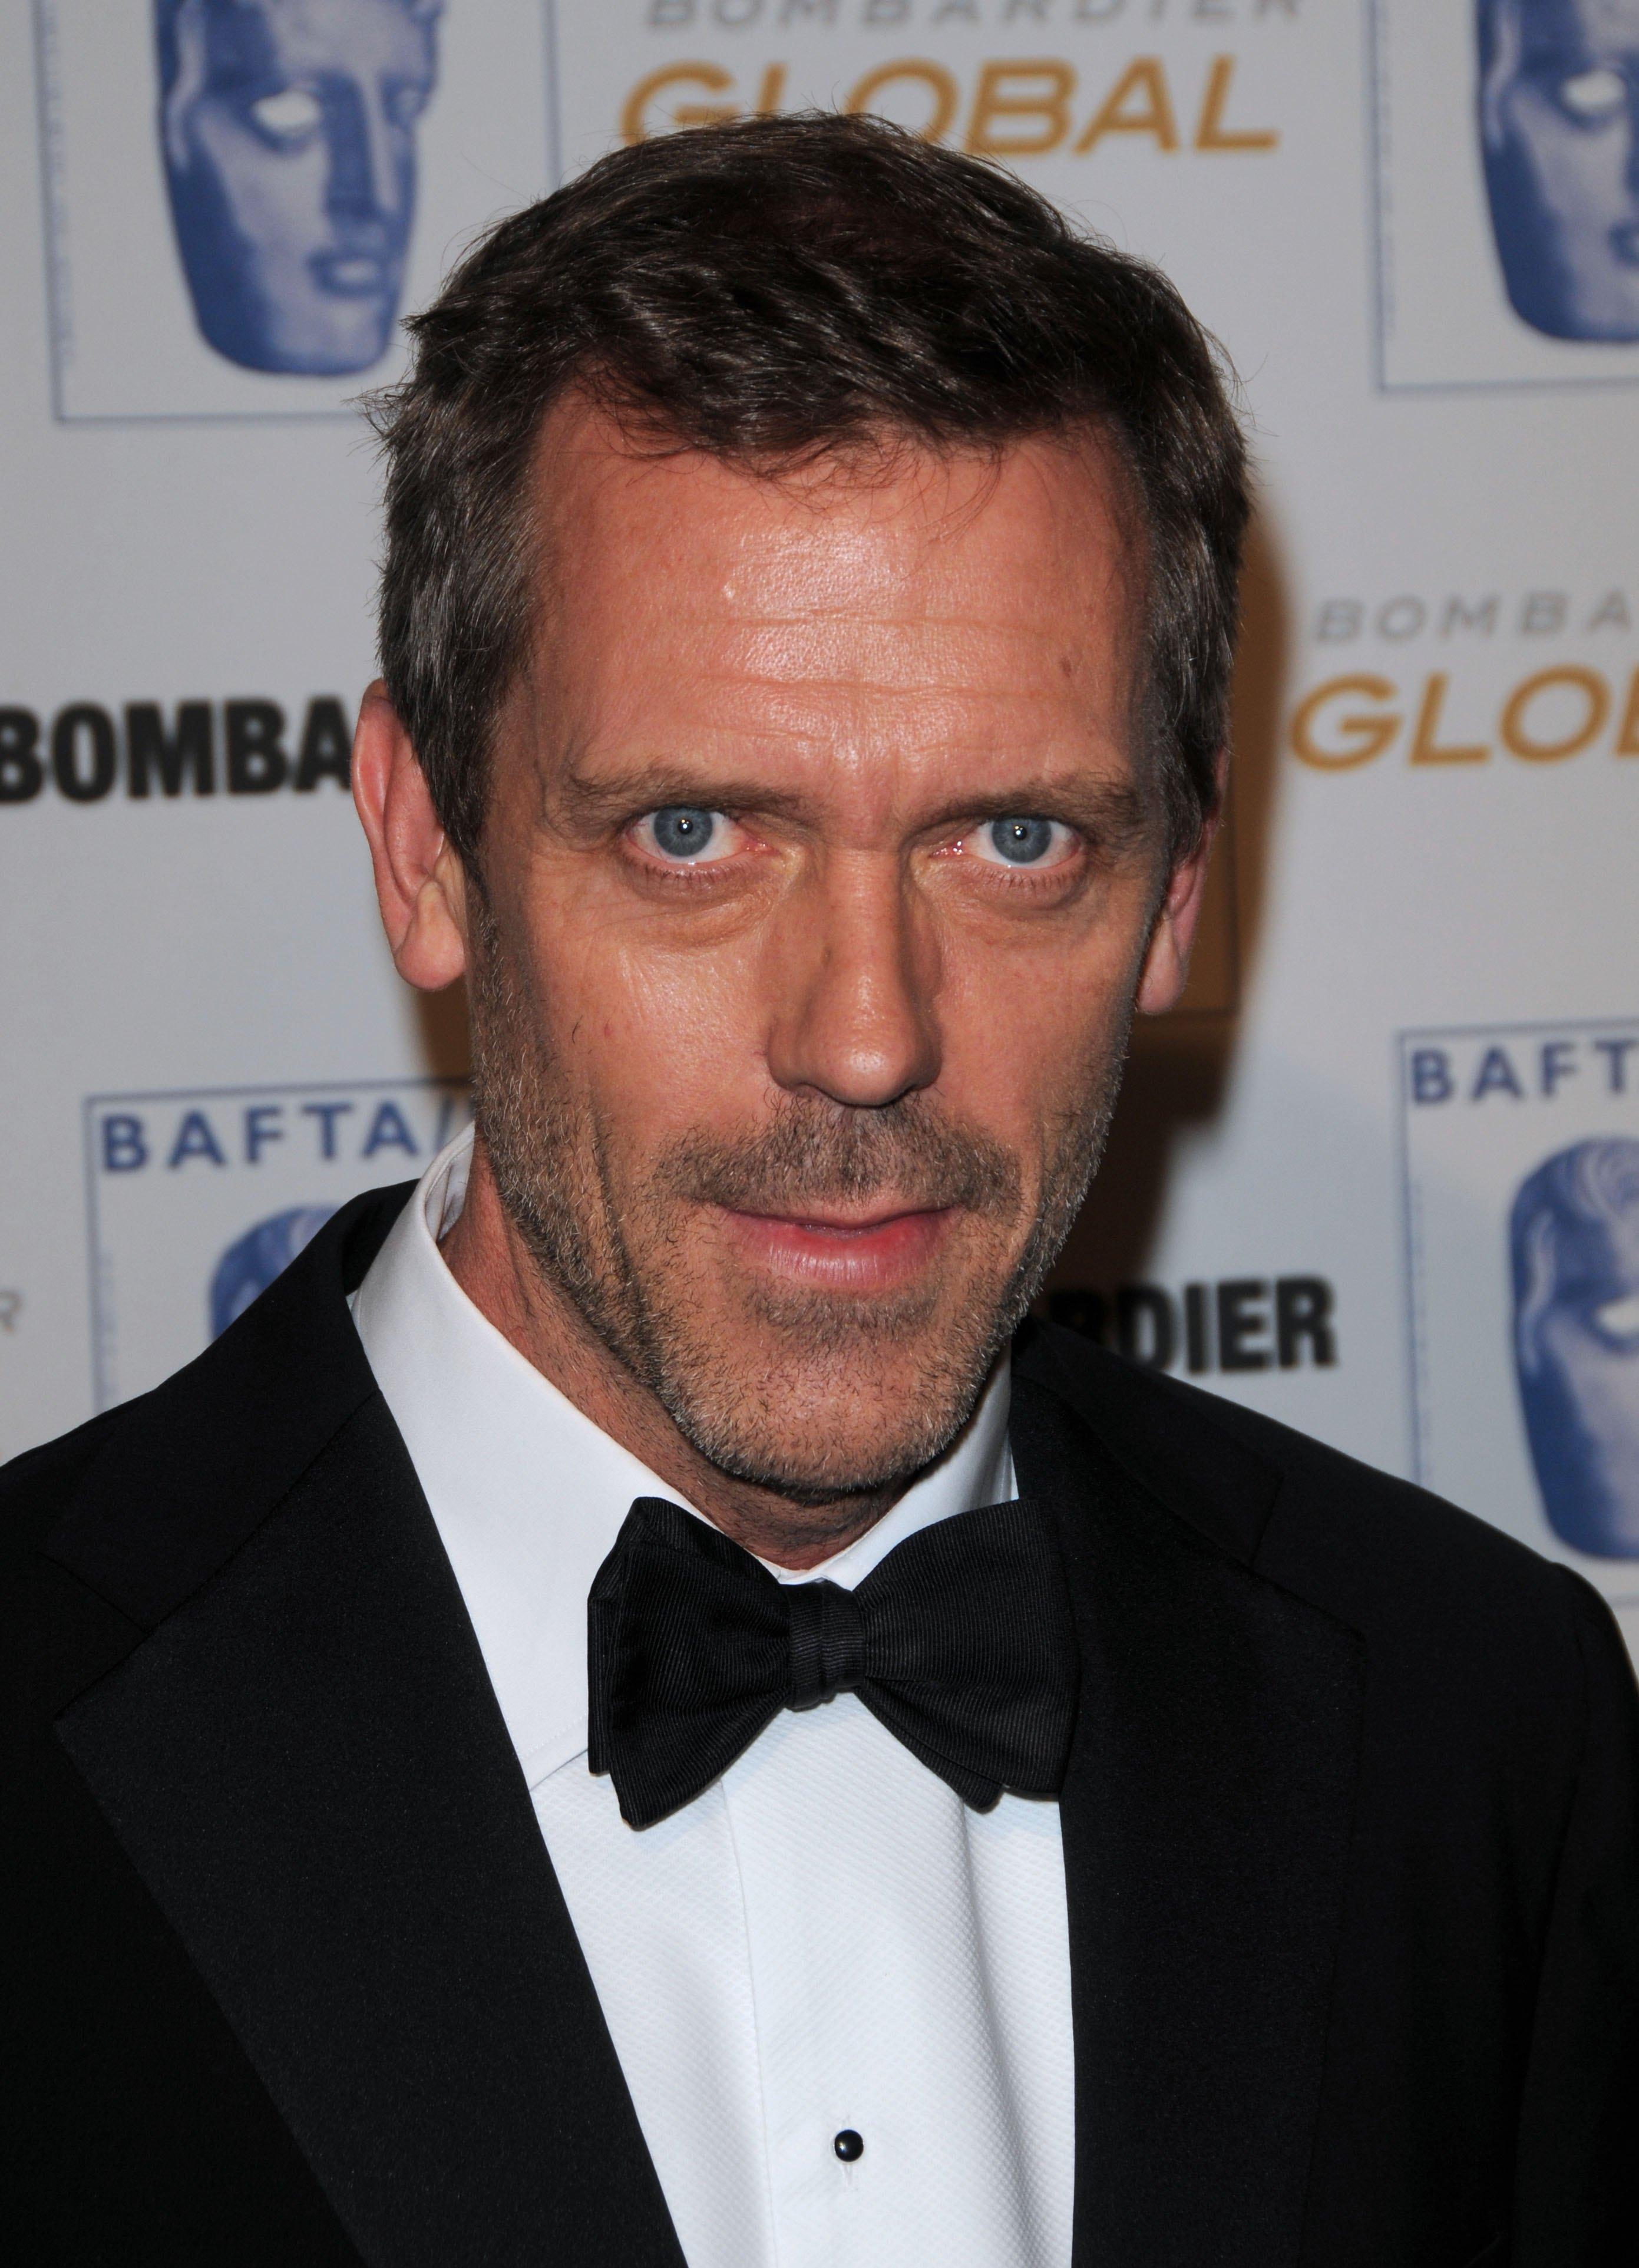 43161_Hugh_Laurie_-_BAFTA-LA_Britannia_Awards_2008_CU_ISA02_122_1114lo.jpg